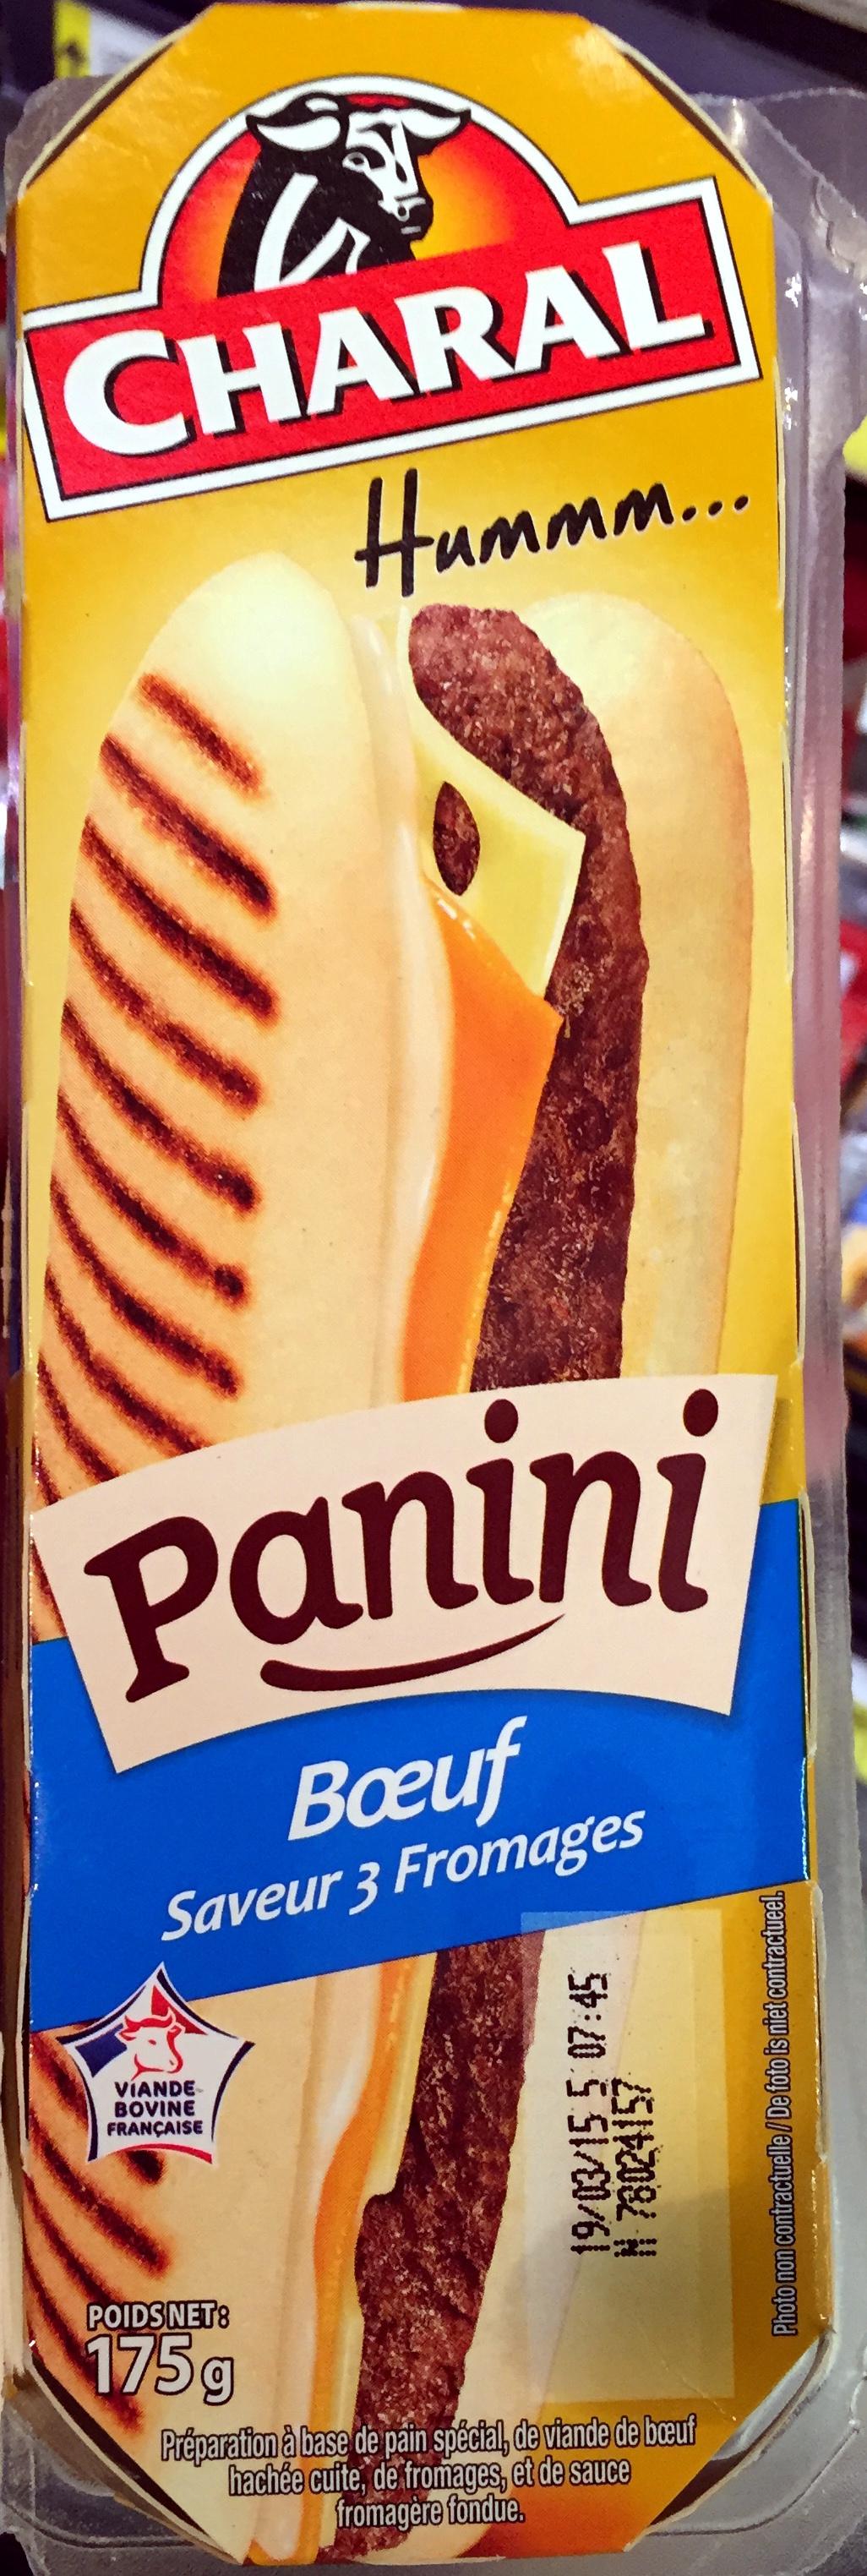 Panini Boeuf saveur 3 Fromages - Produit - fr